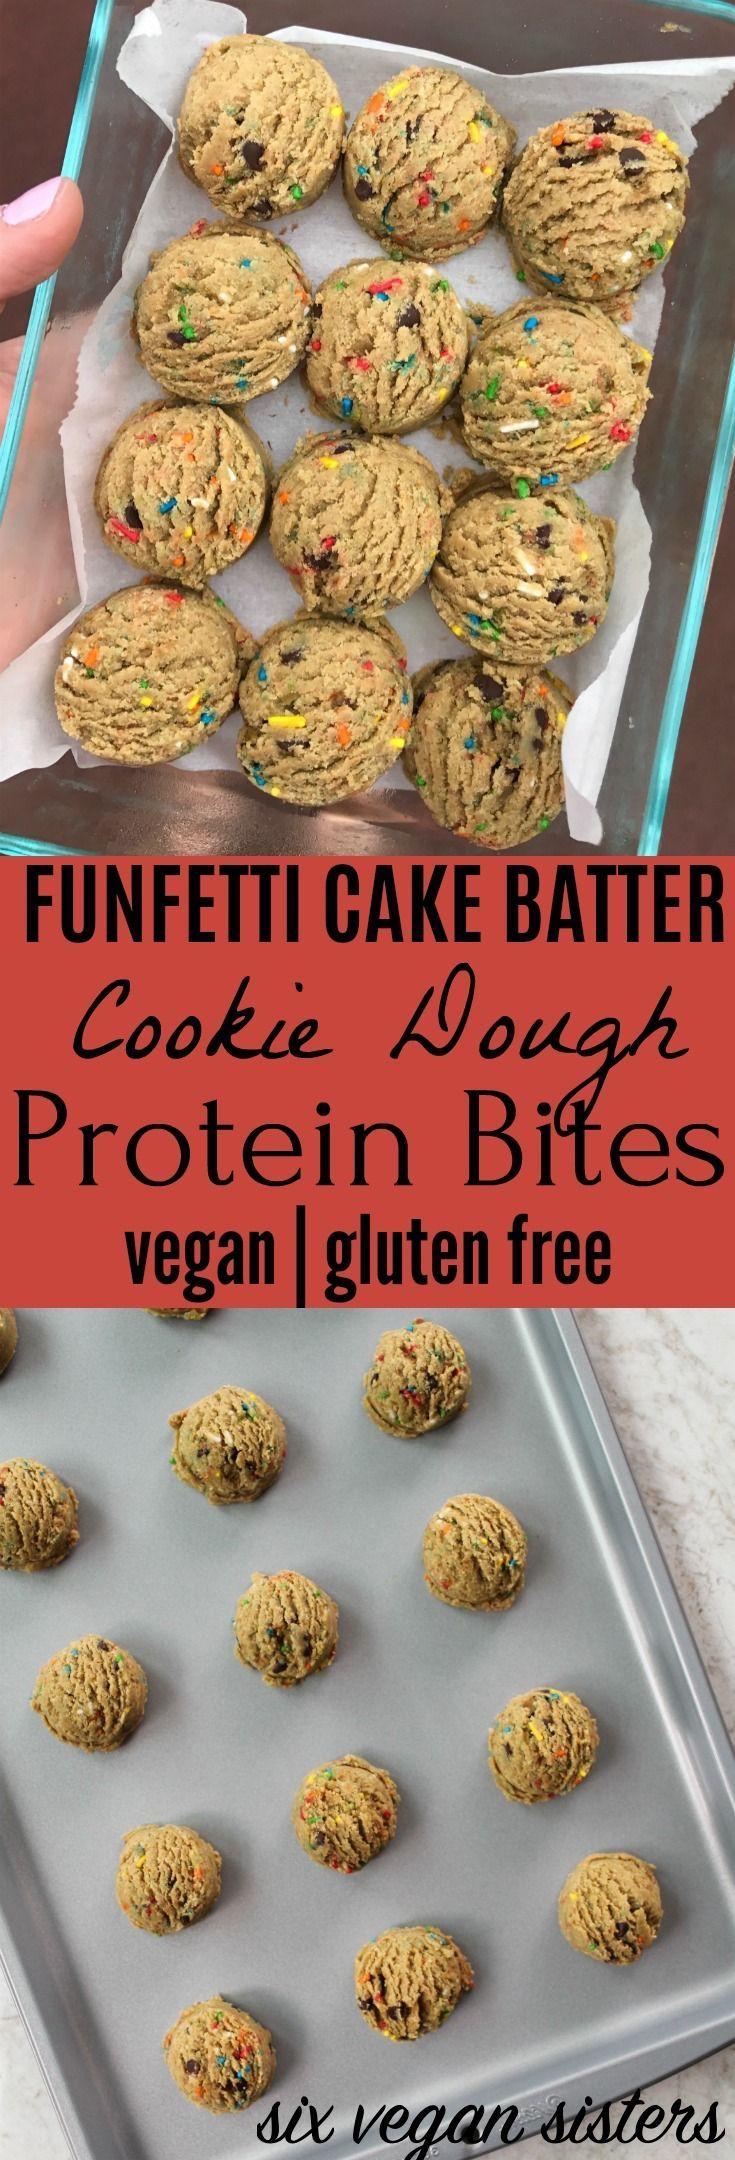 Funfetti cake batter cookie dough protein bites vegan